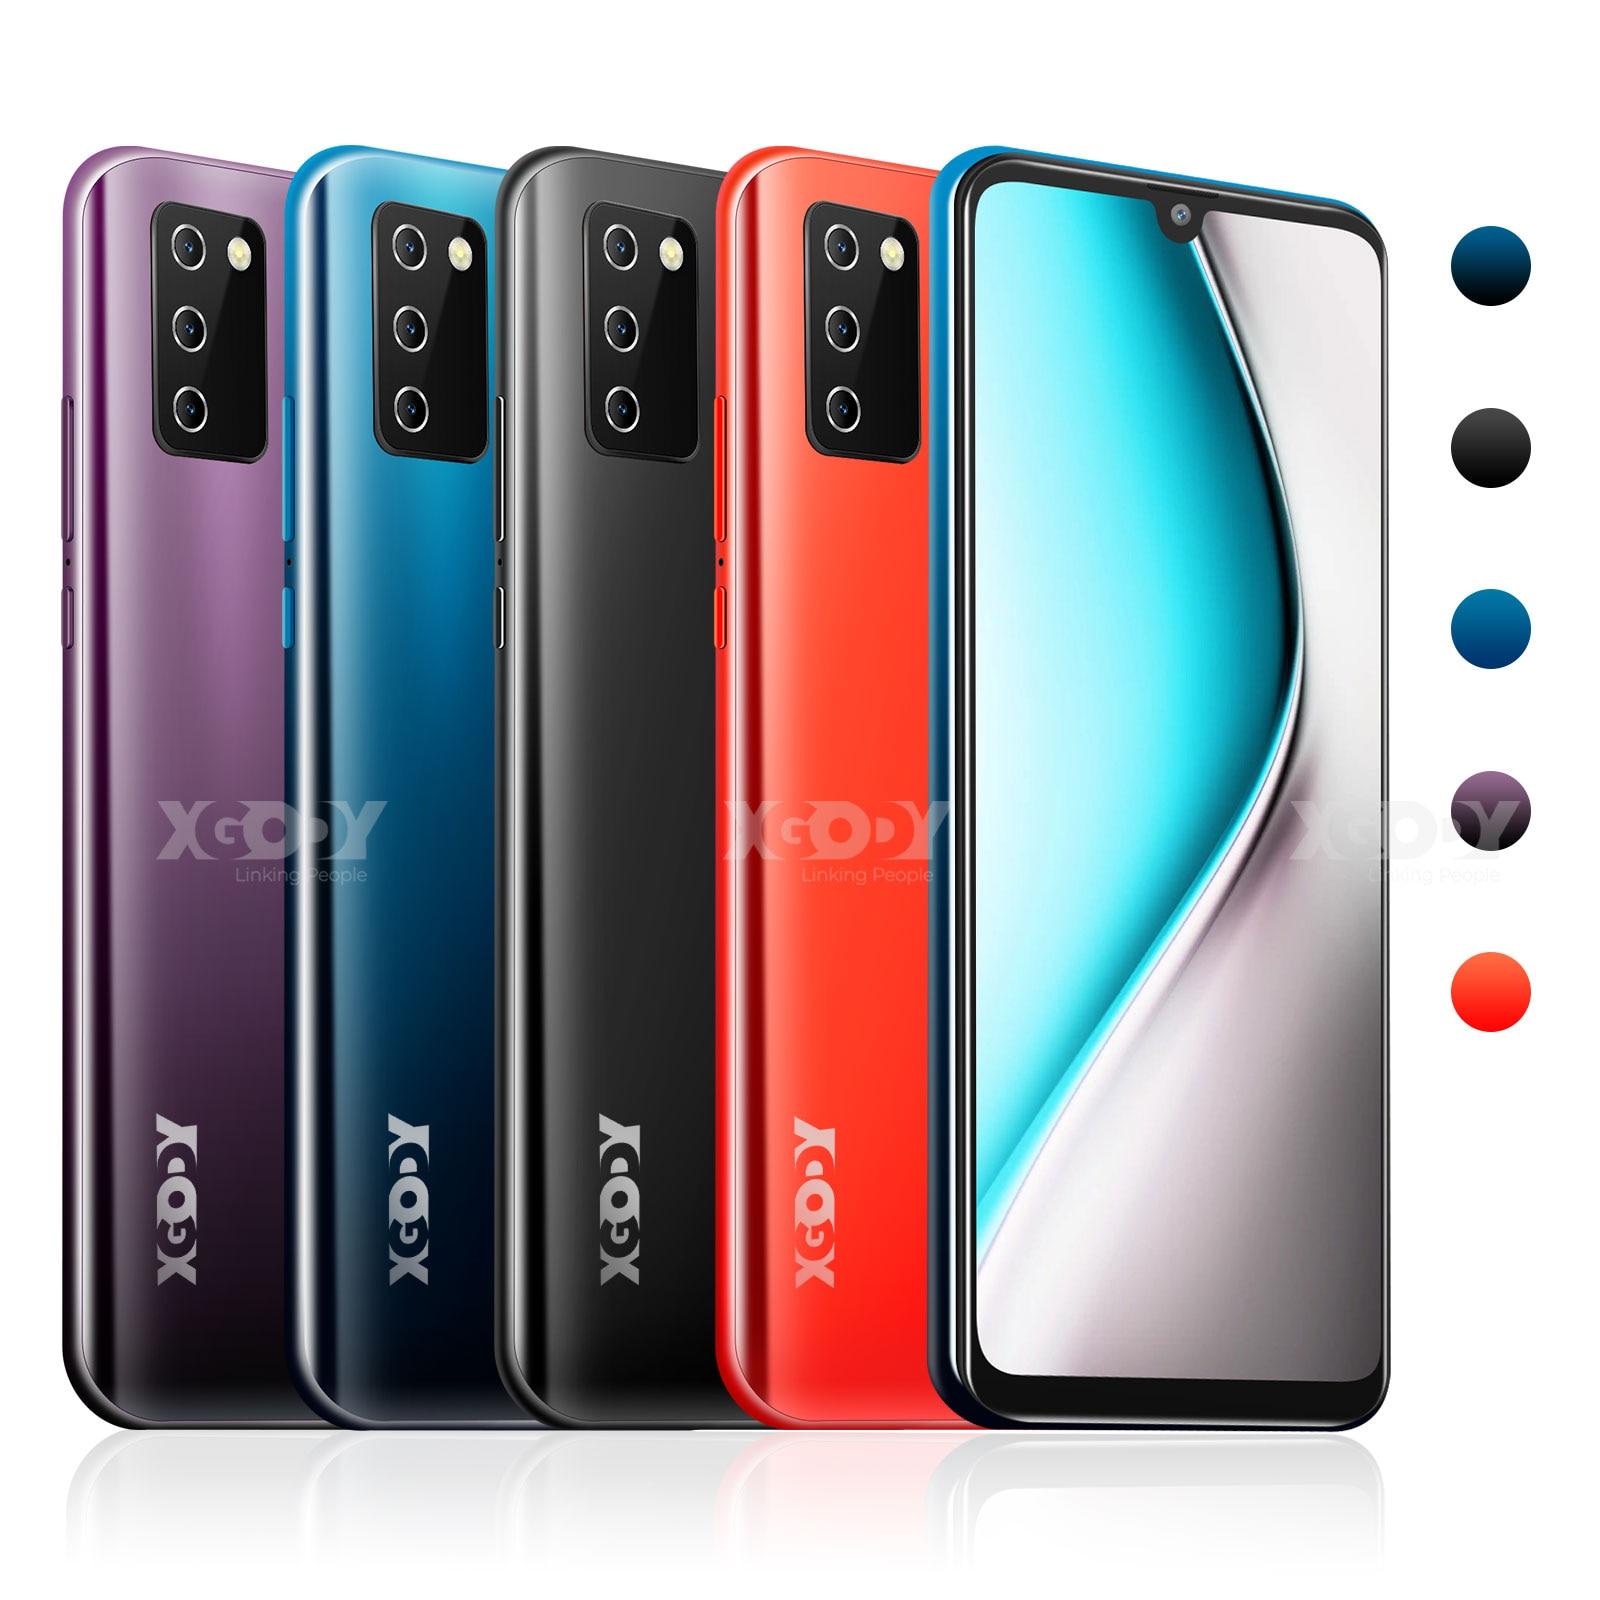 "XGODY NOTE 10 Android 9.0 4G mobile phones 2GB RAM 16GB ROM Face ID 5MP Camera Dual SIM GPS WIFI 7.2"" 19:9 smartphone Quad Core 5"